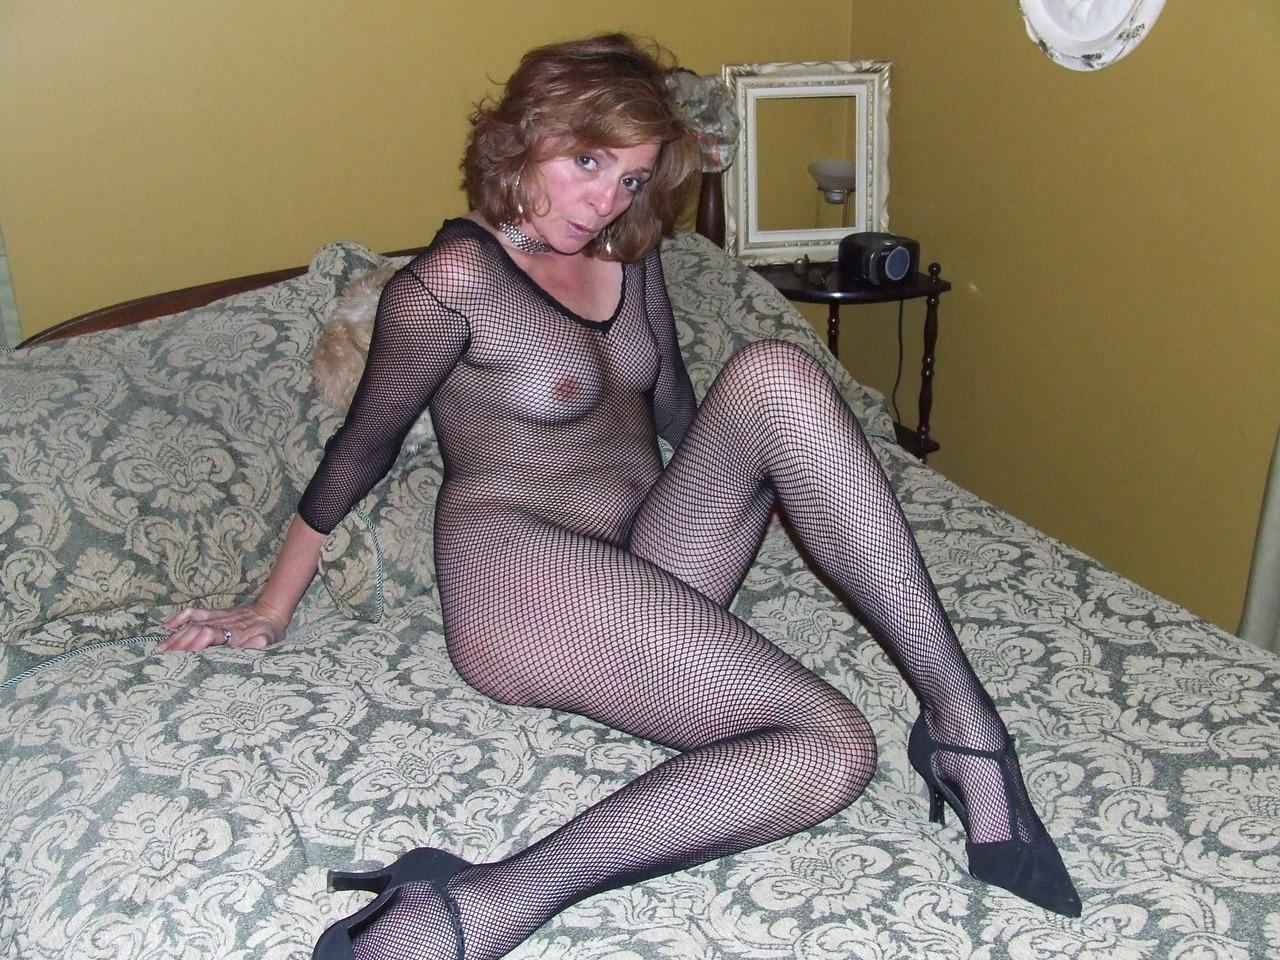 Amateur sex husbands affair